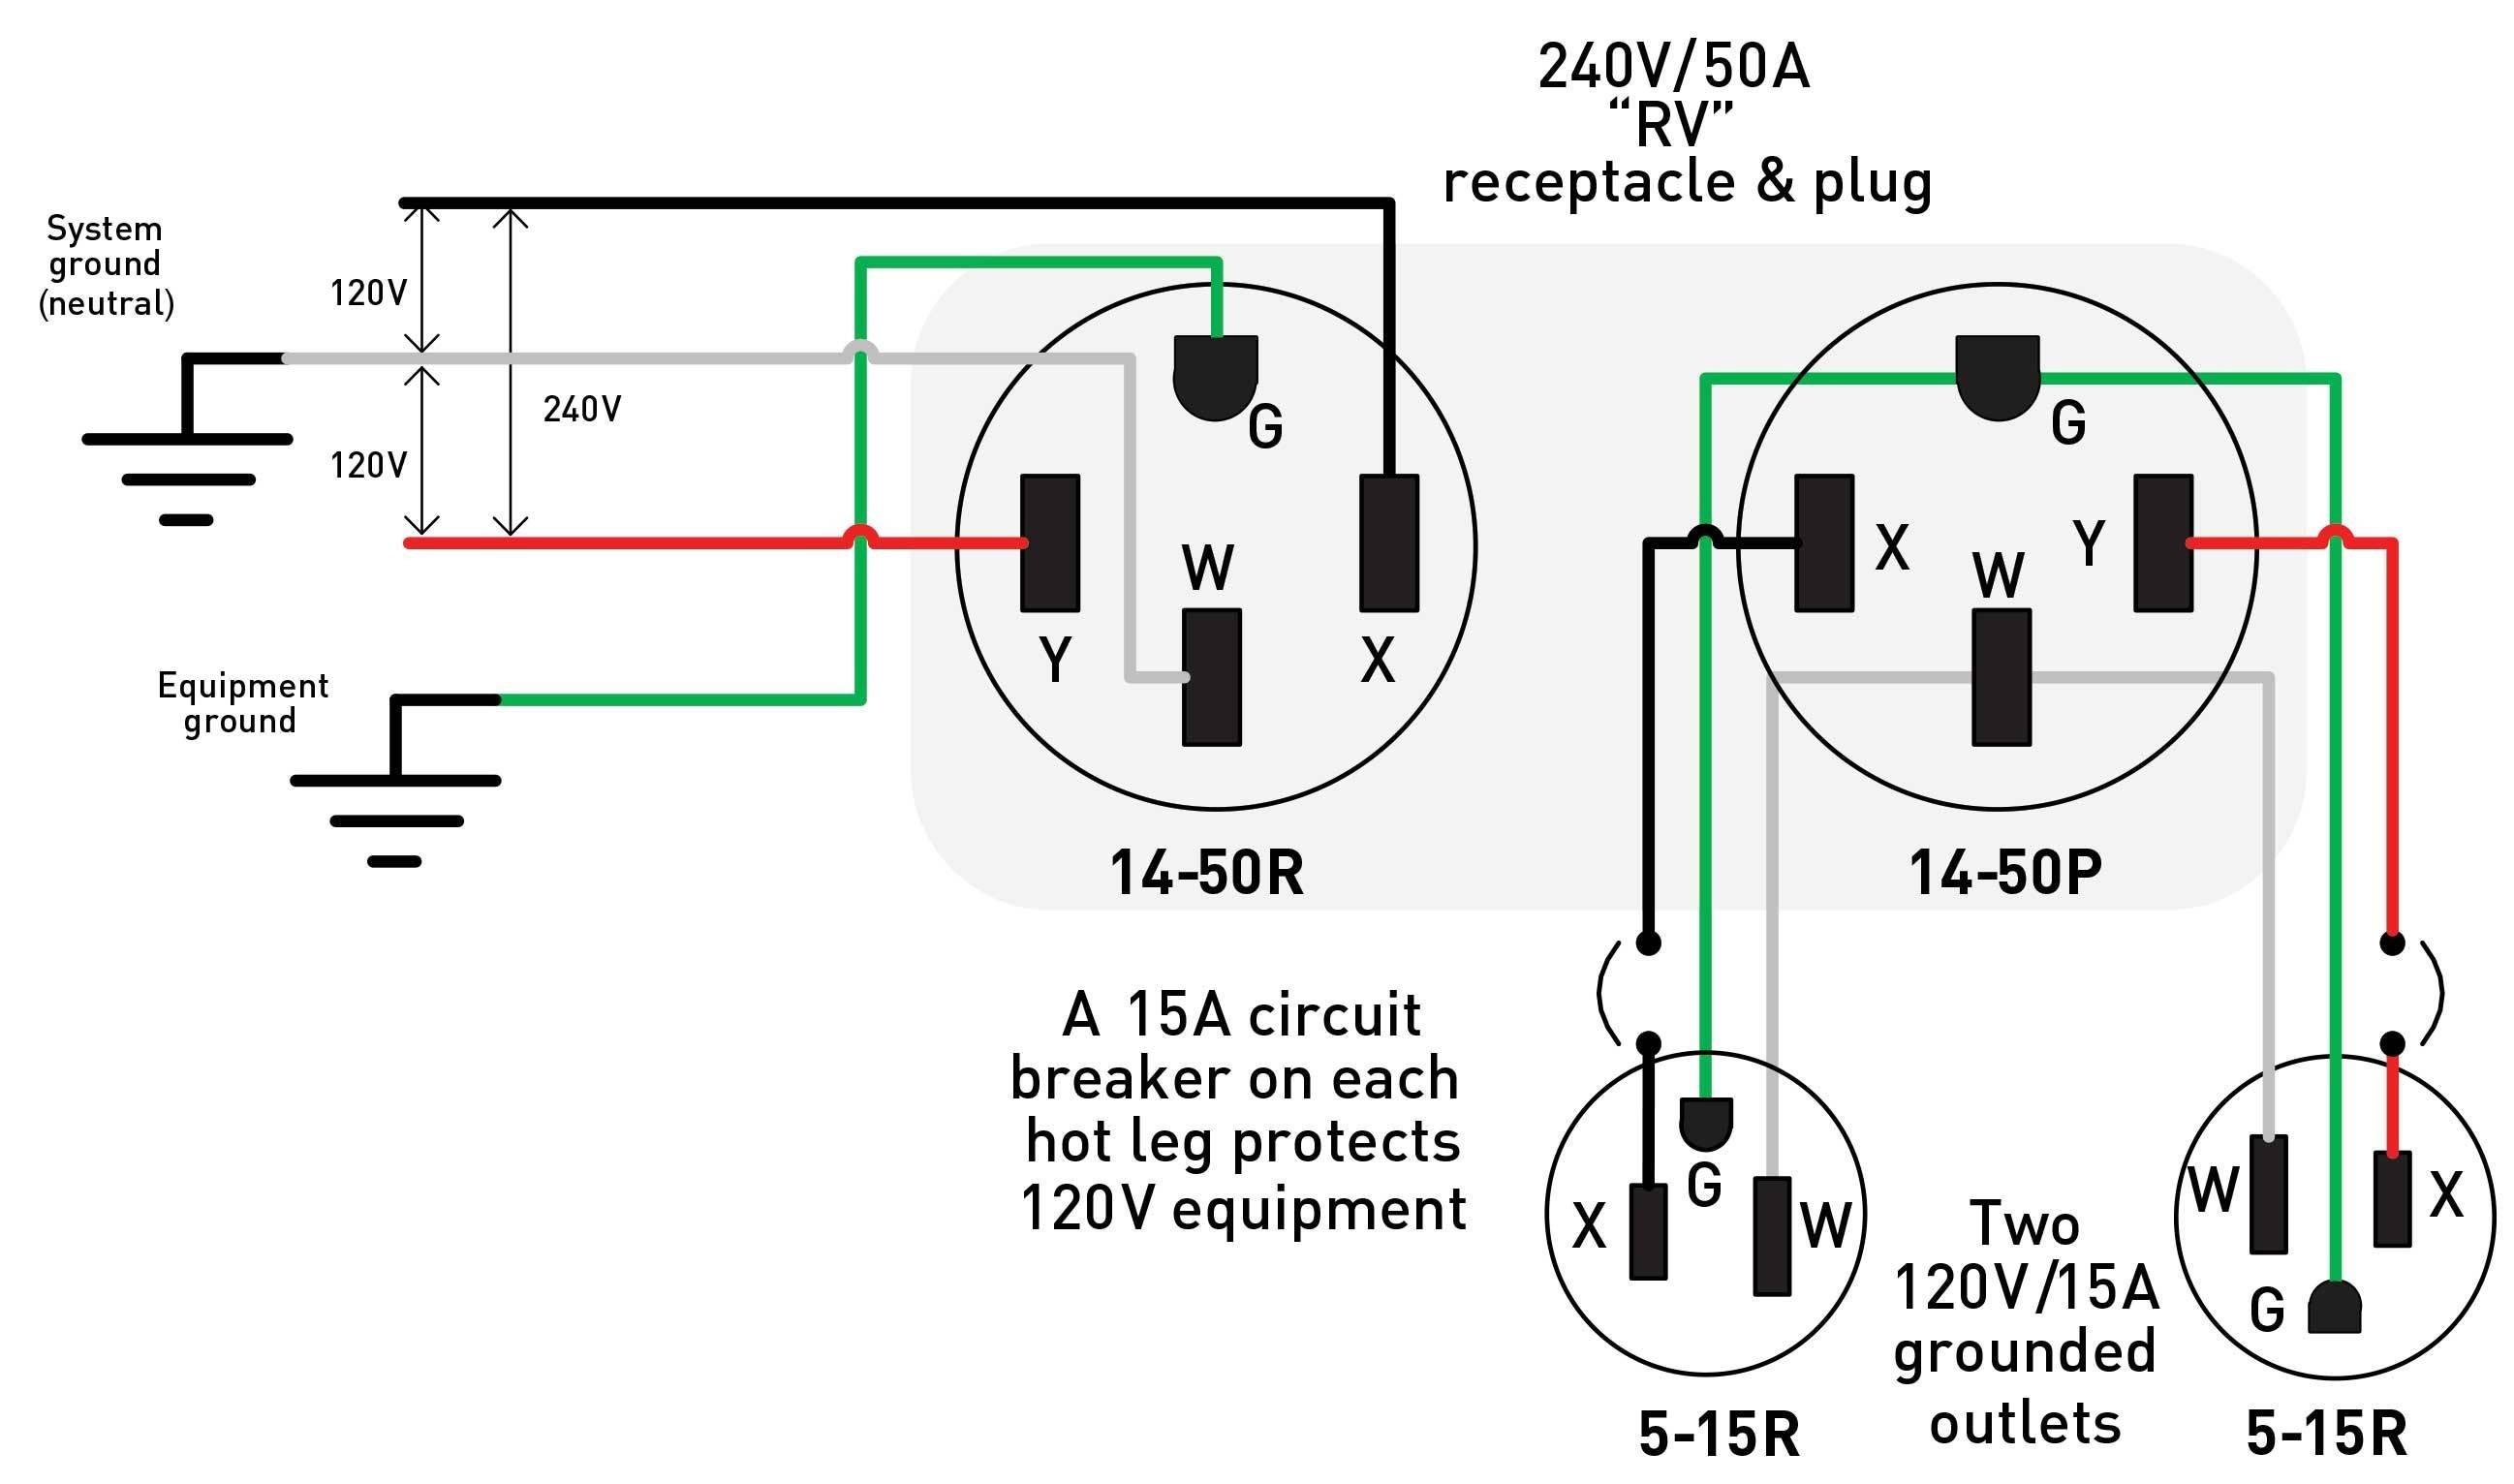 220v Plug Wiring Diagram Wiring Diagram Receptacle Copy 220v Outlet Wiring Diagram and Of 220v Plug Wiring Diagram